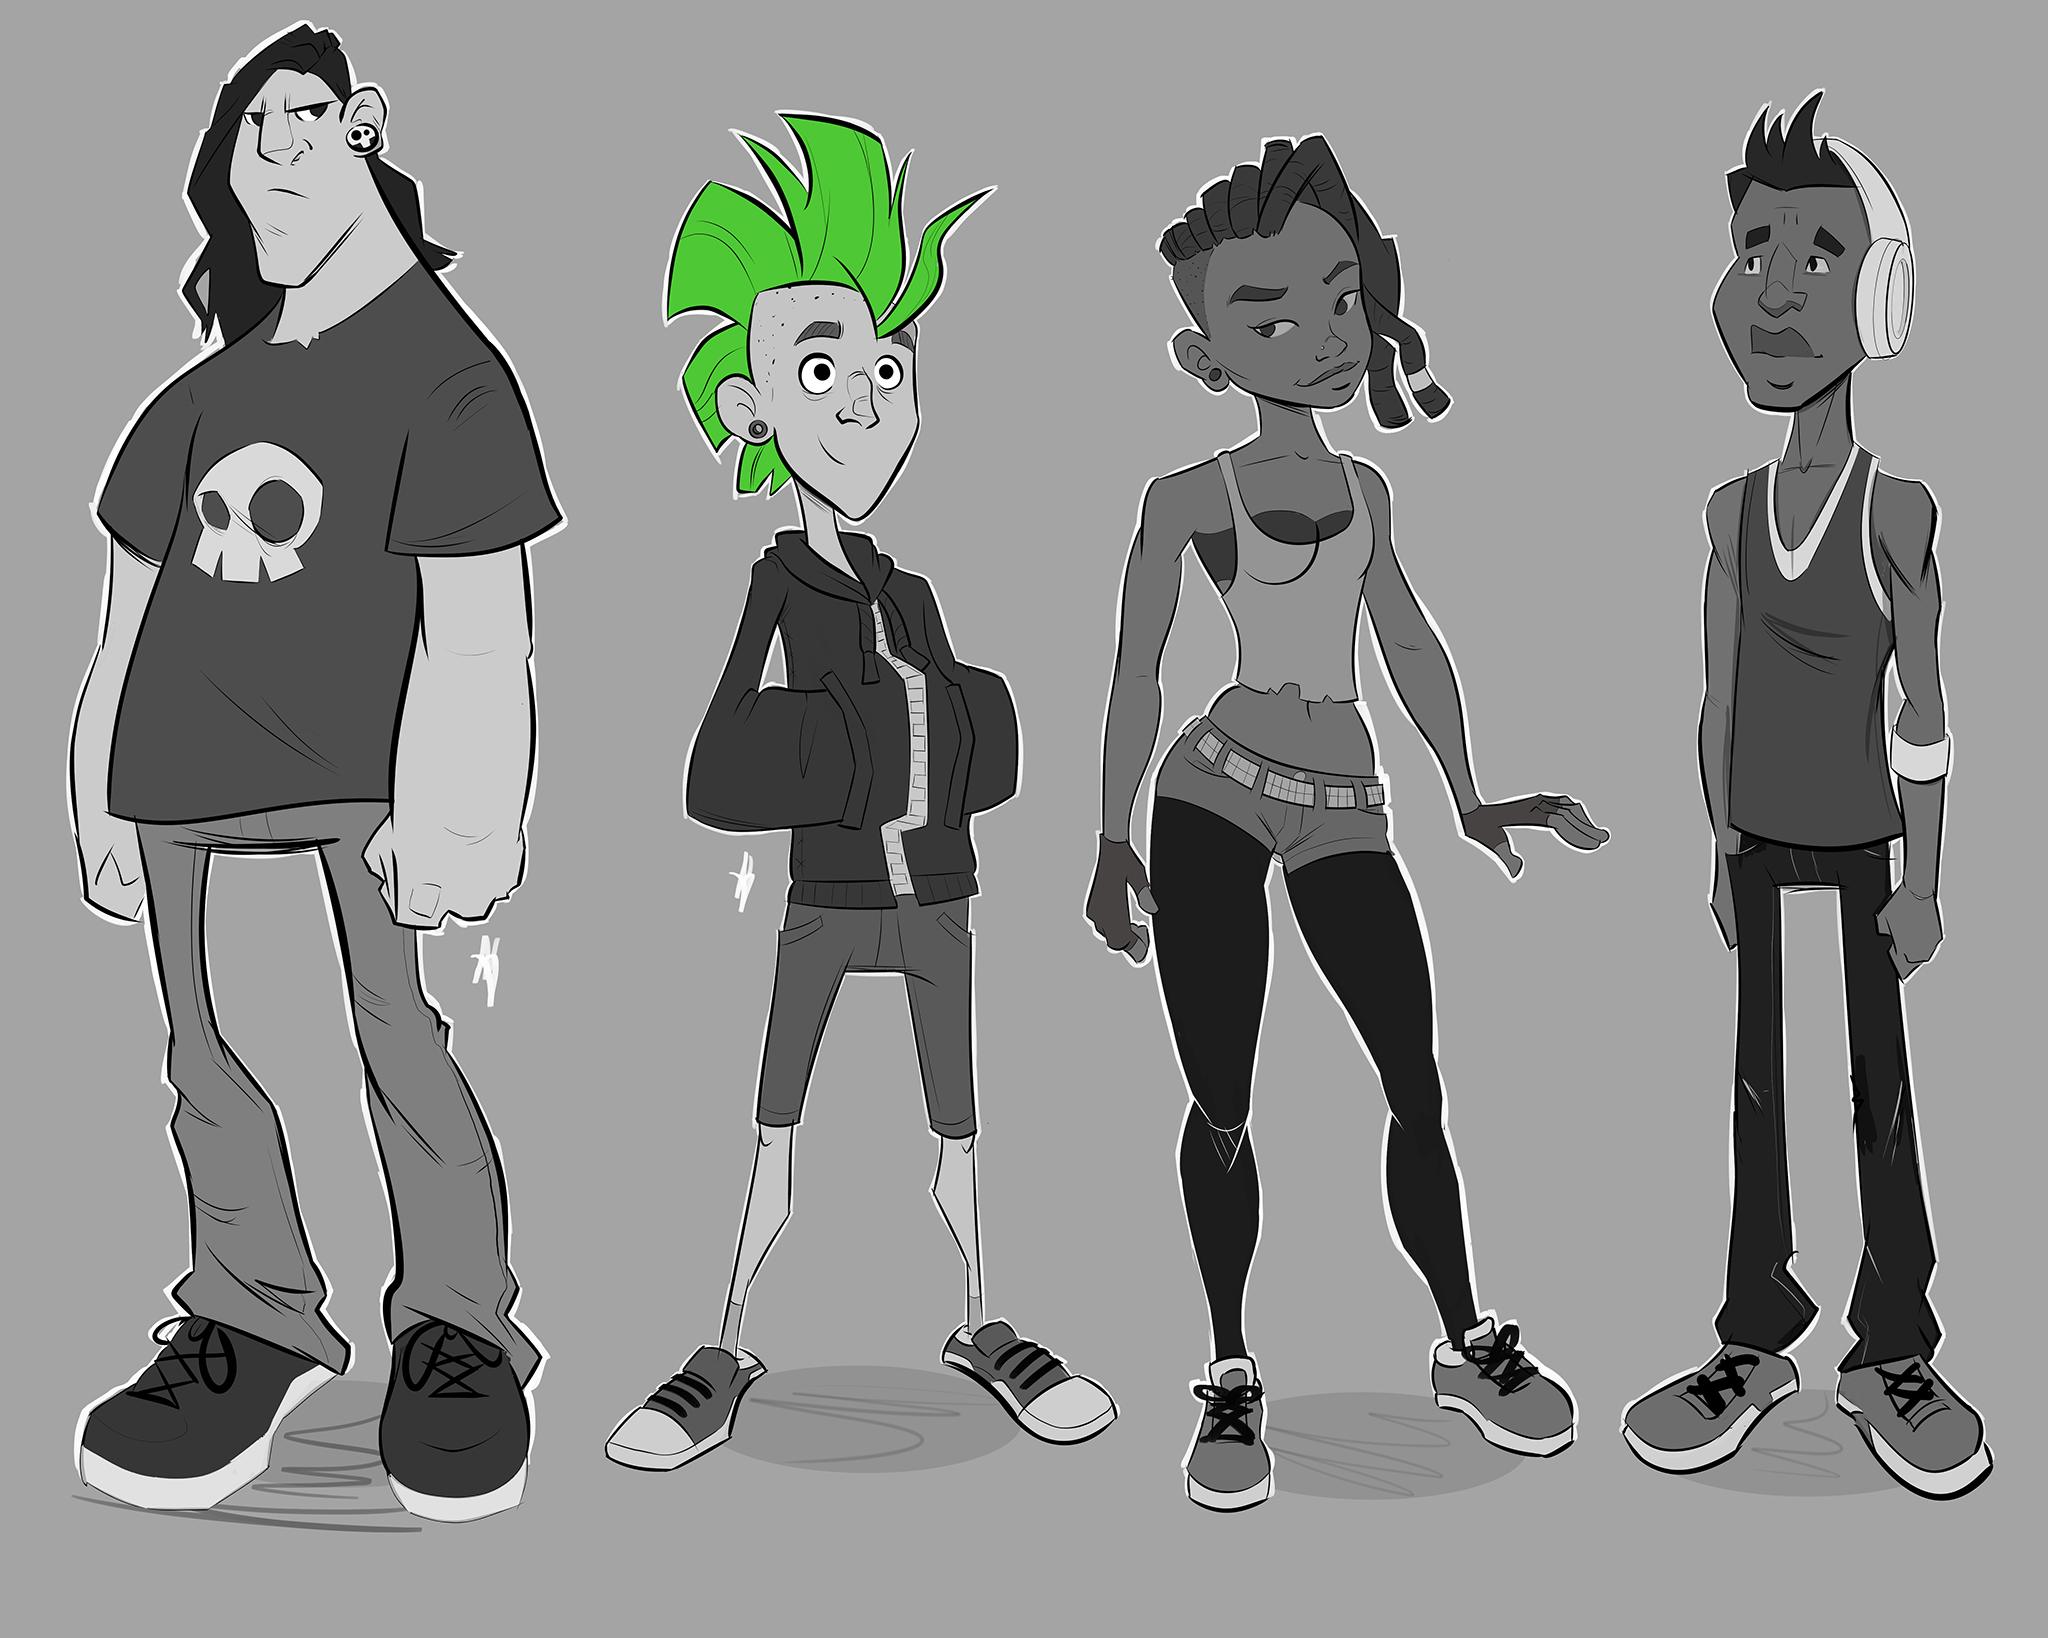 punks-lineup.jpg